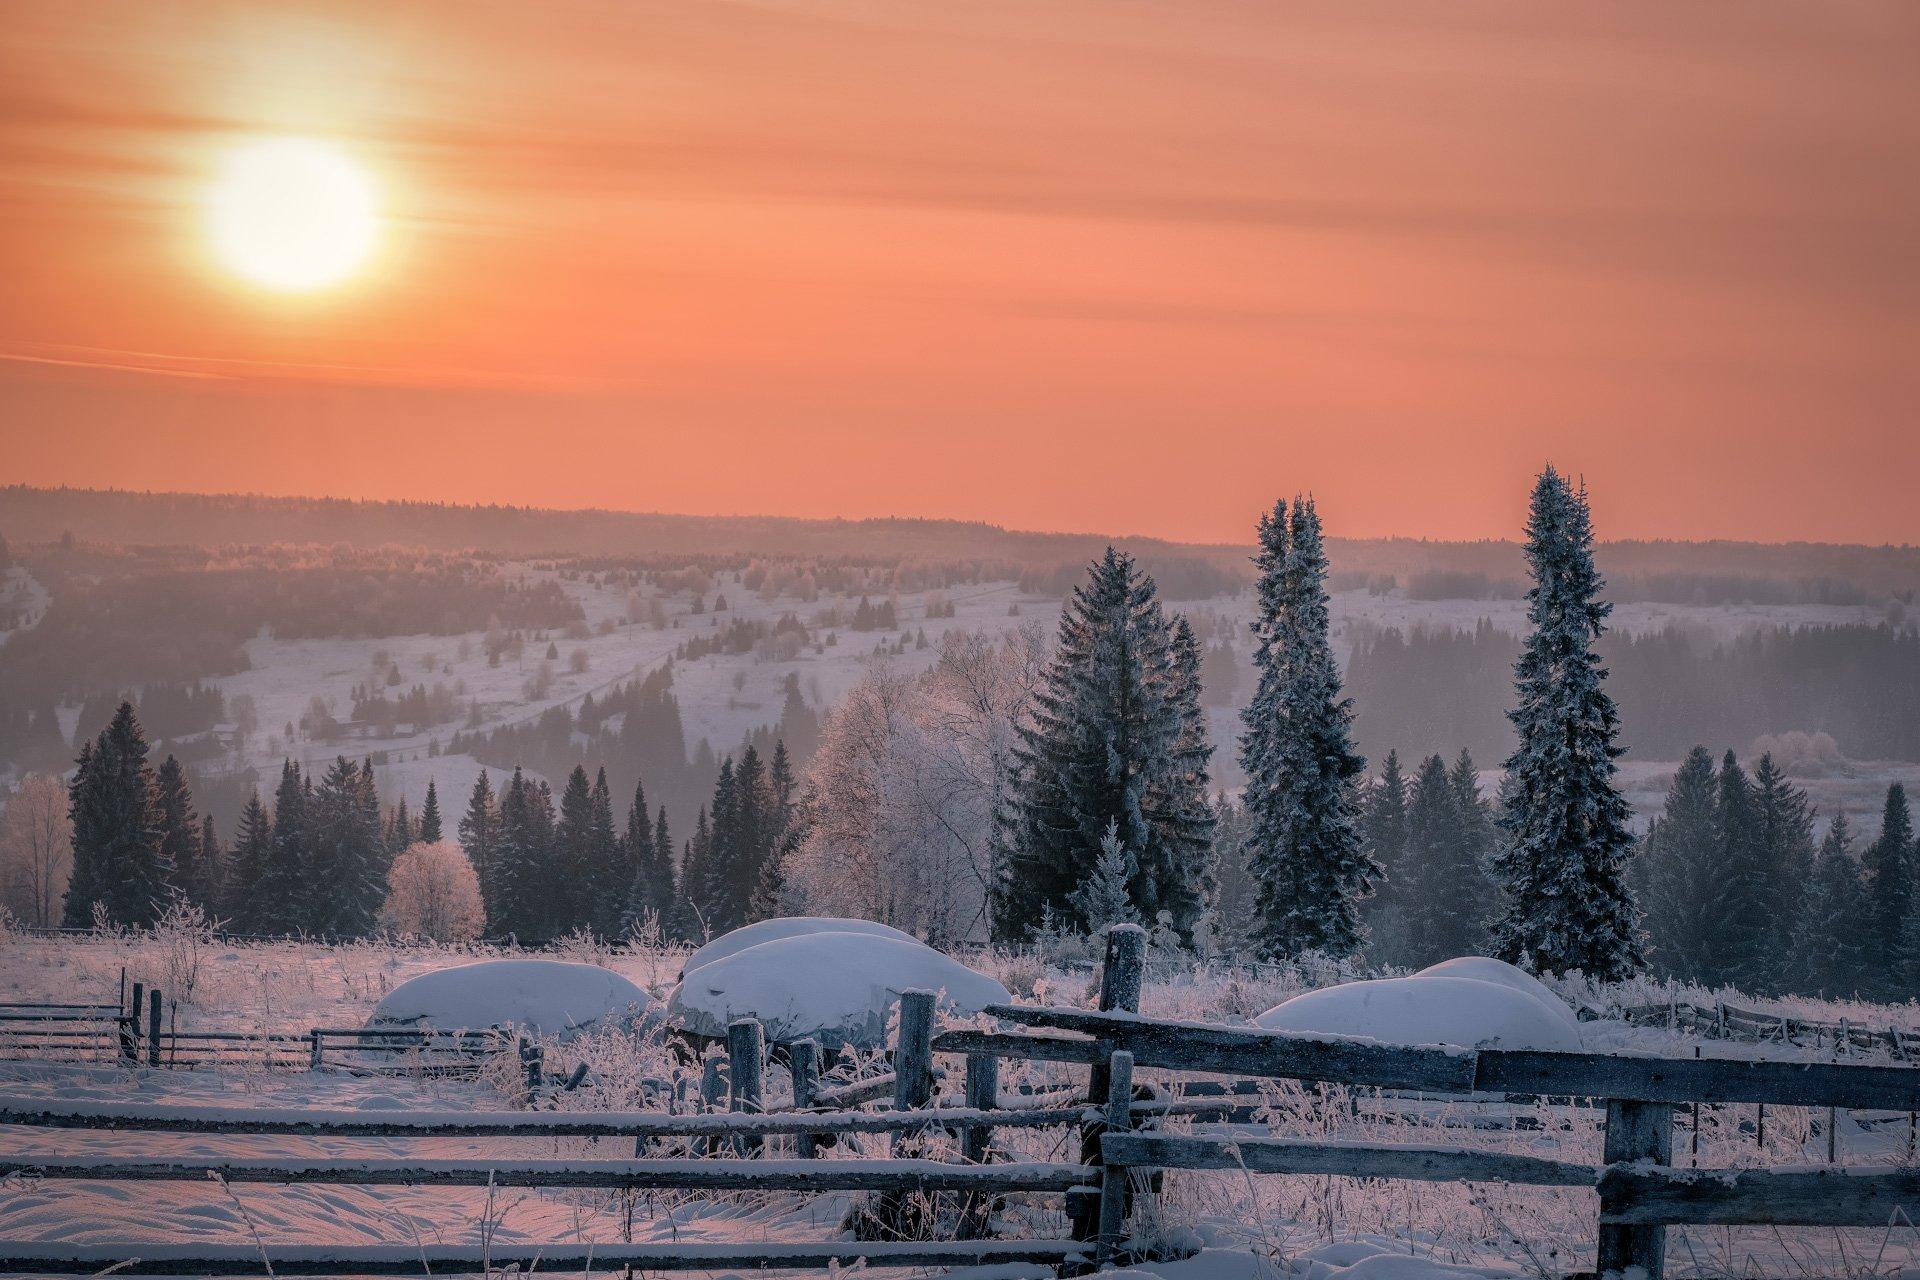 деревня, вечер, закат, мороз, зима, долина, чусовая, лес, поле, пейзаж, пермь, Андрей Чиж